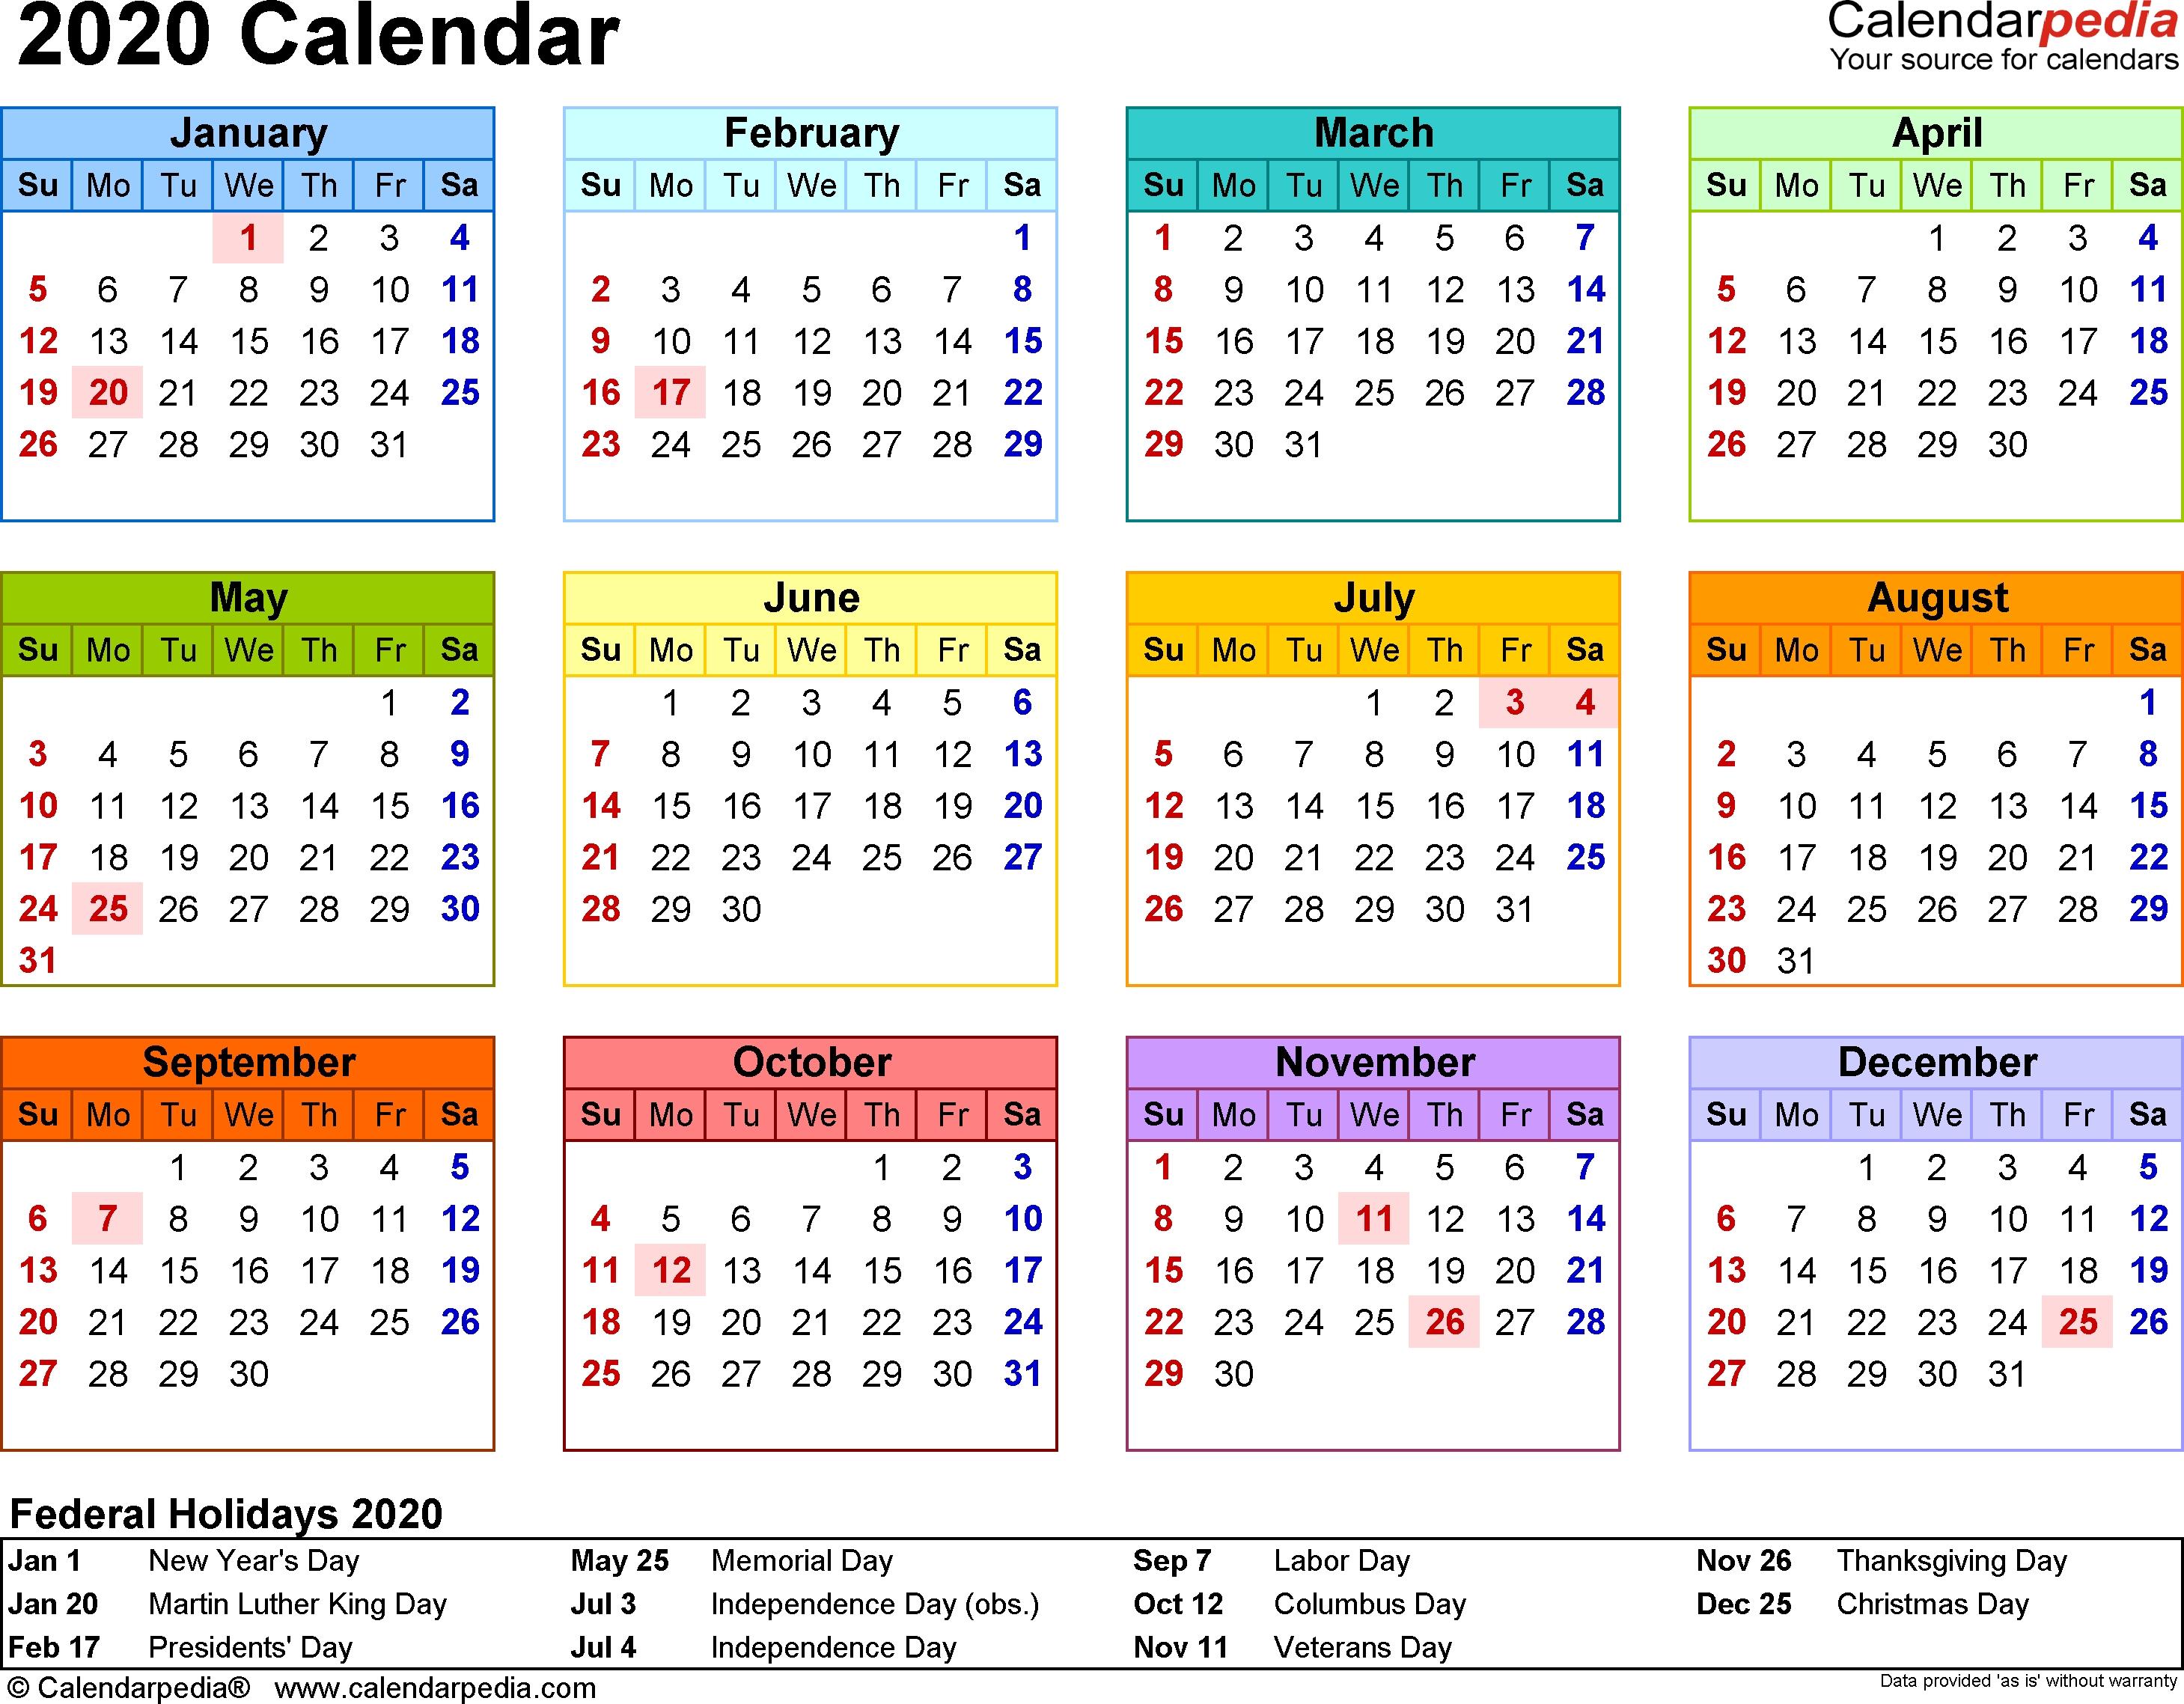 2020 Calendar - 17 Free Printable Word Calendar Templates 2020 Calendar Template Indesign